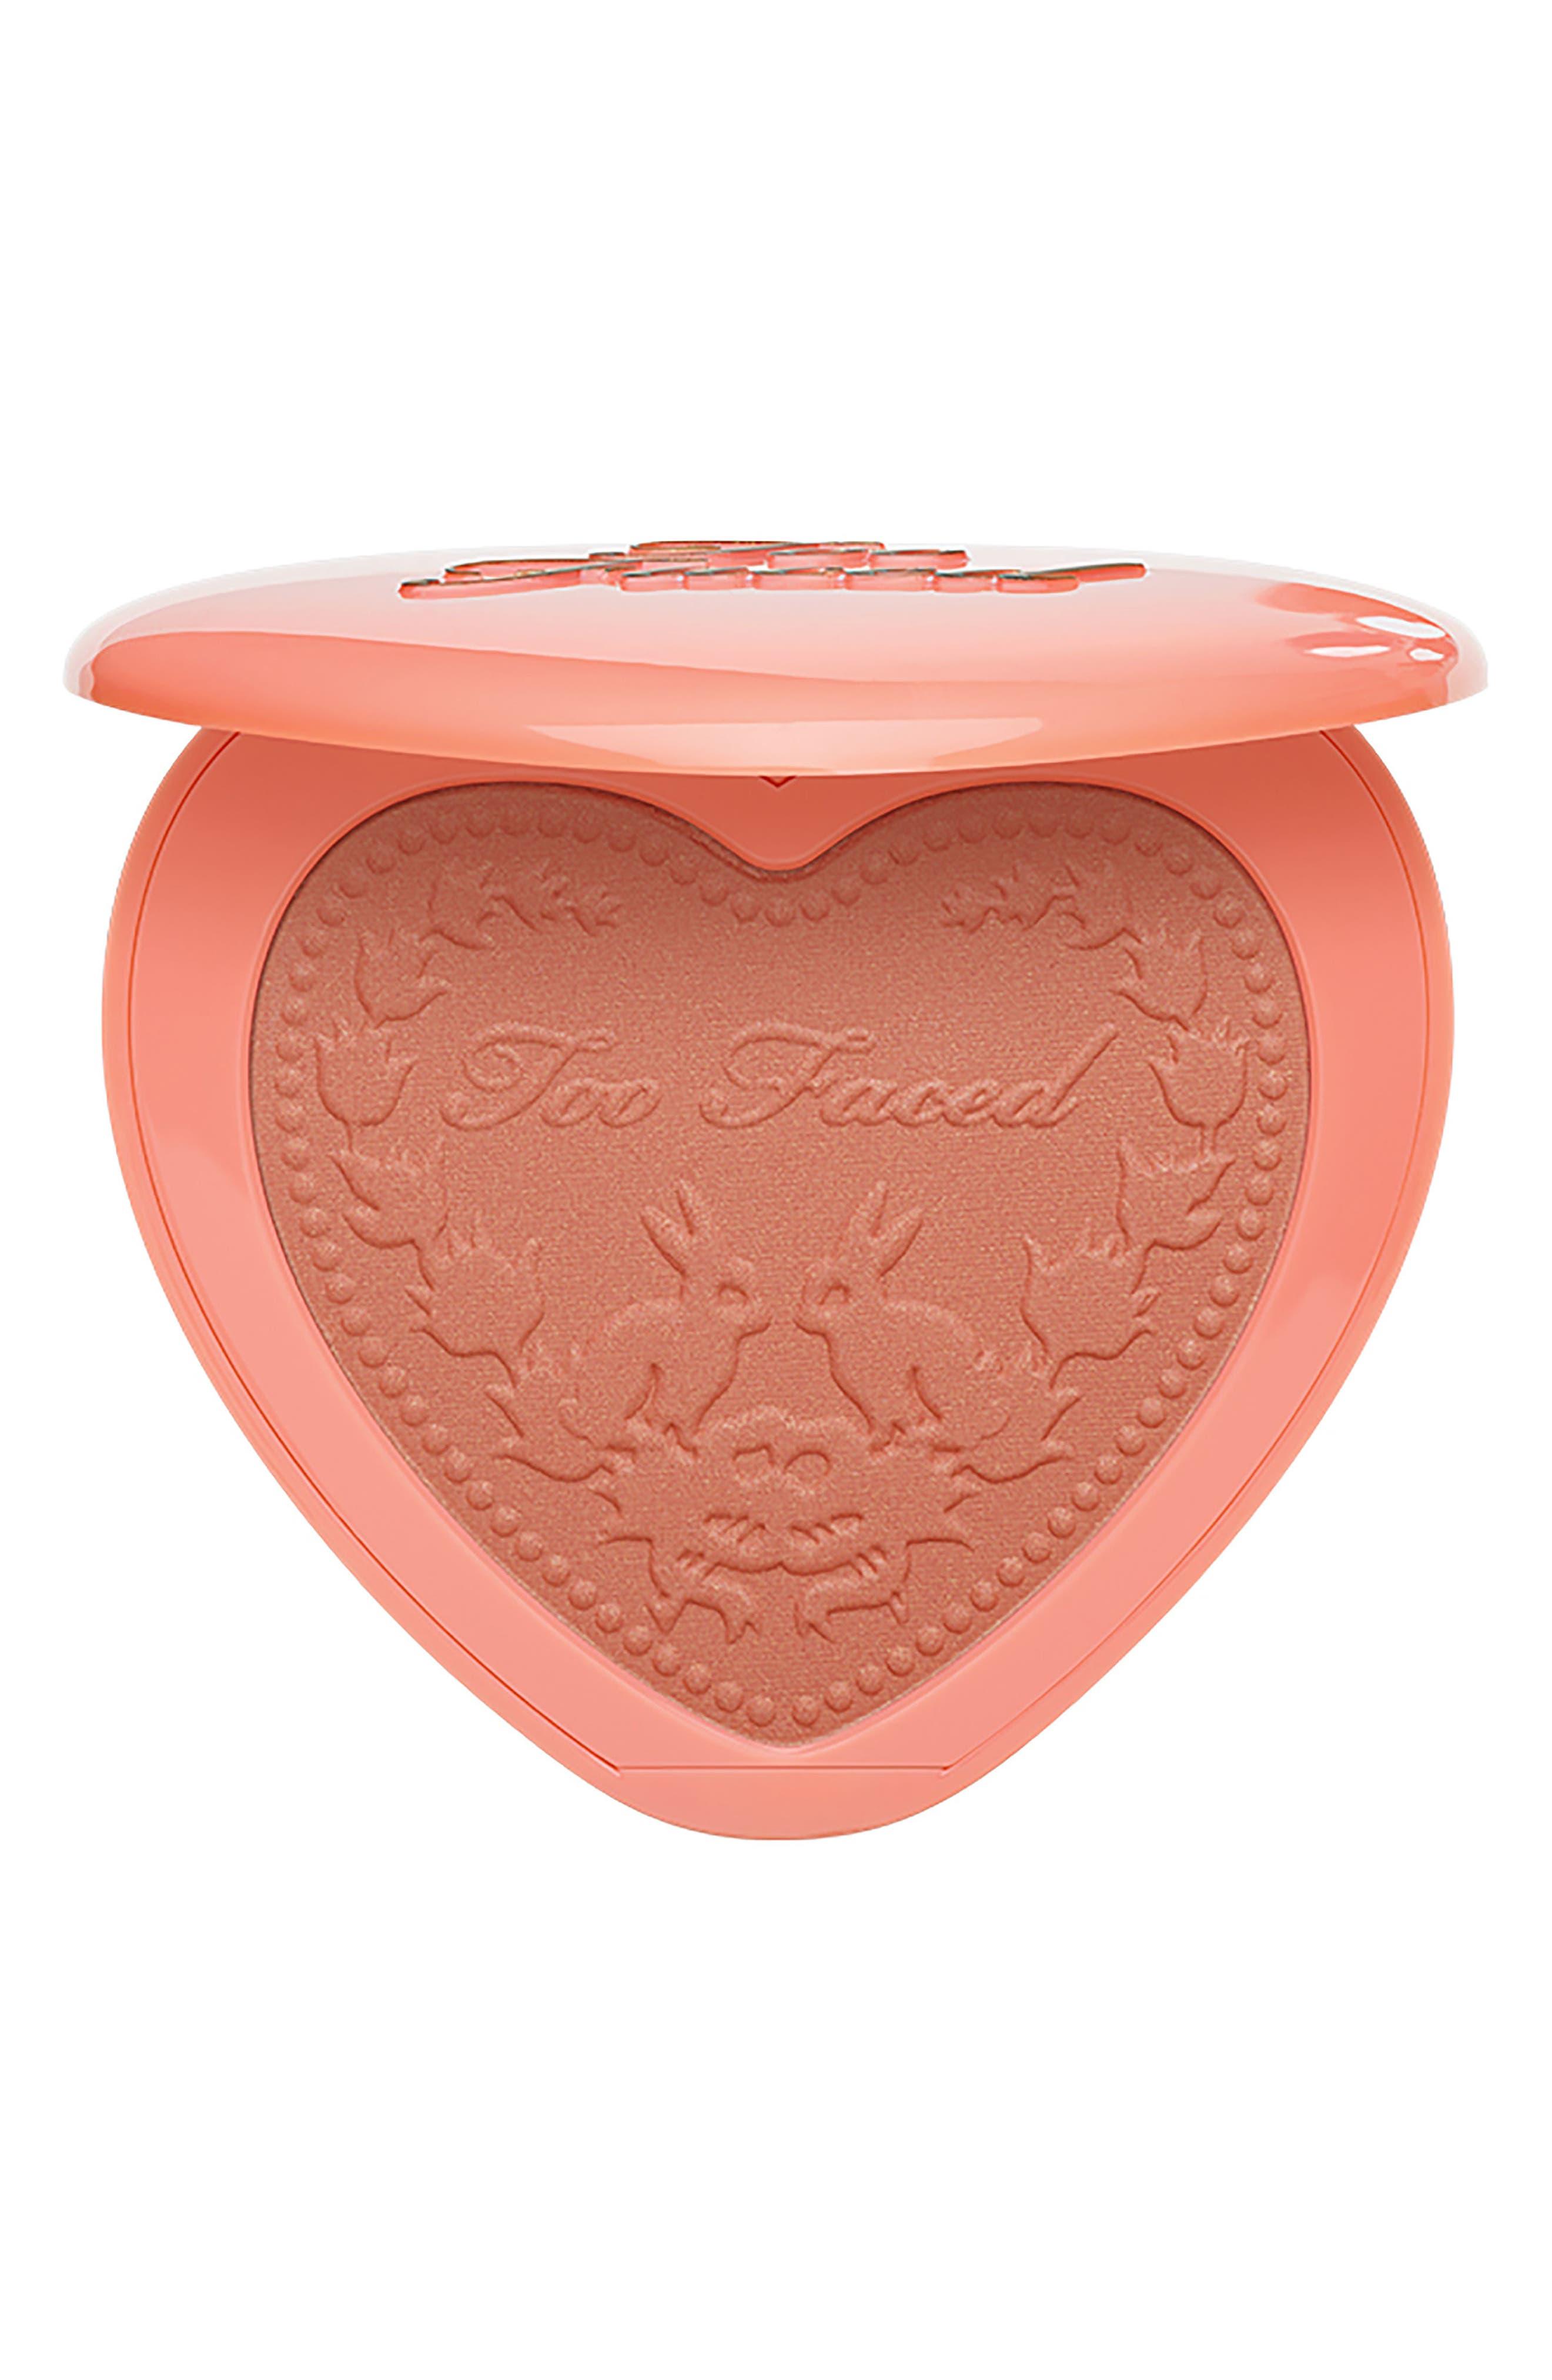 Love Flush Blush,                         Main,                         color, I Will Always Love You